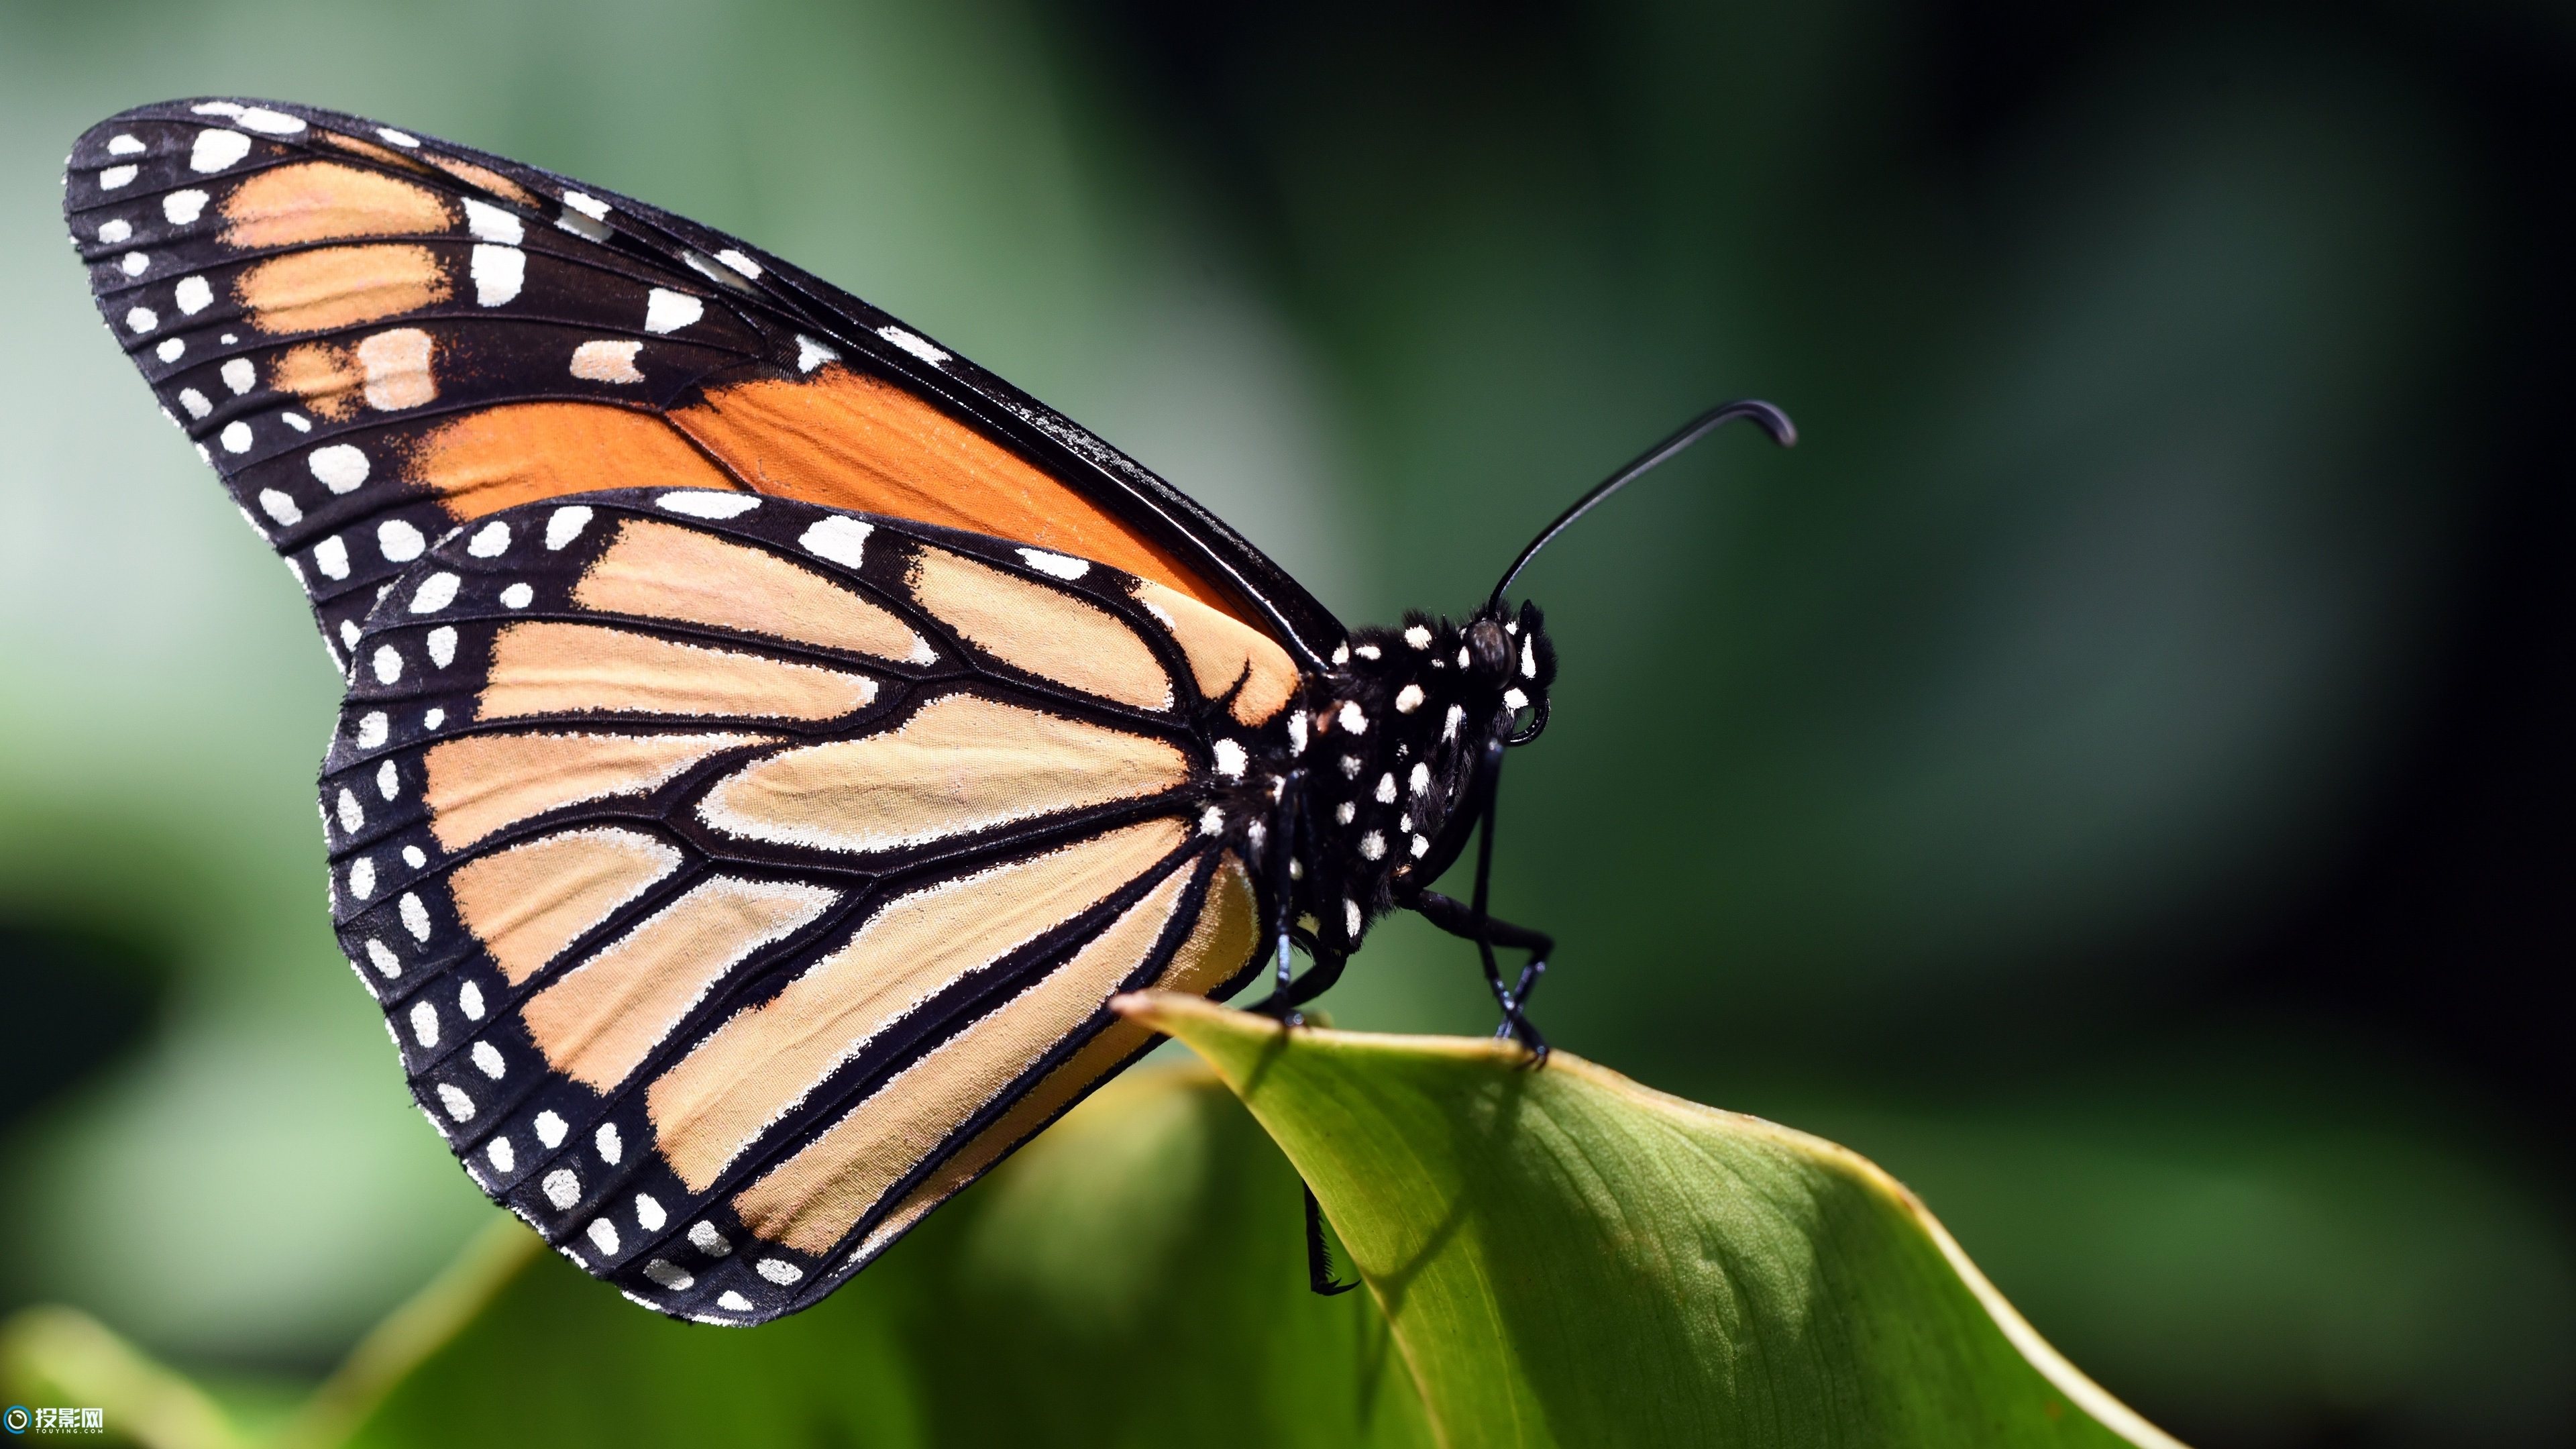 4K 蝴蝶图片大全壁纸16P [分辨率3840x2160x14.4MB]